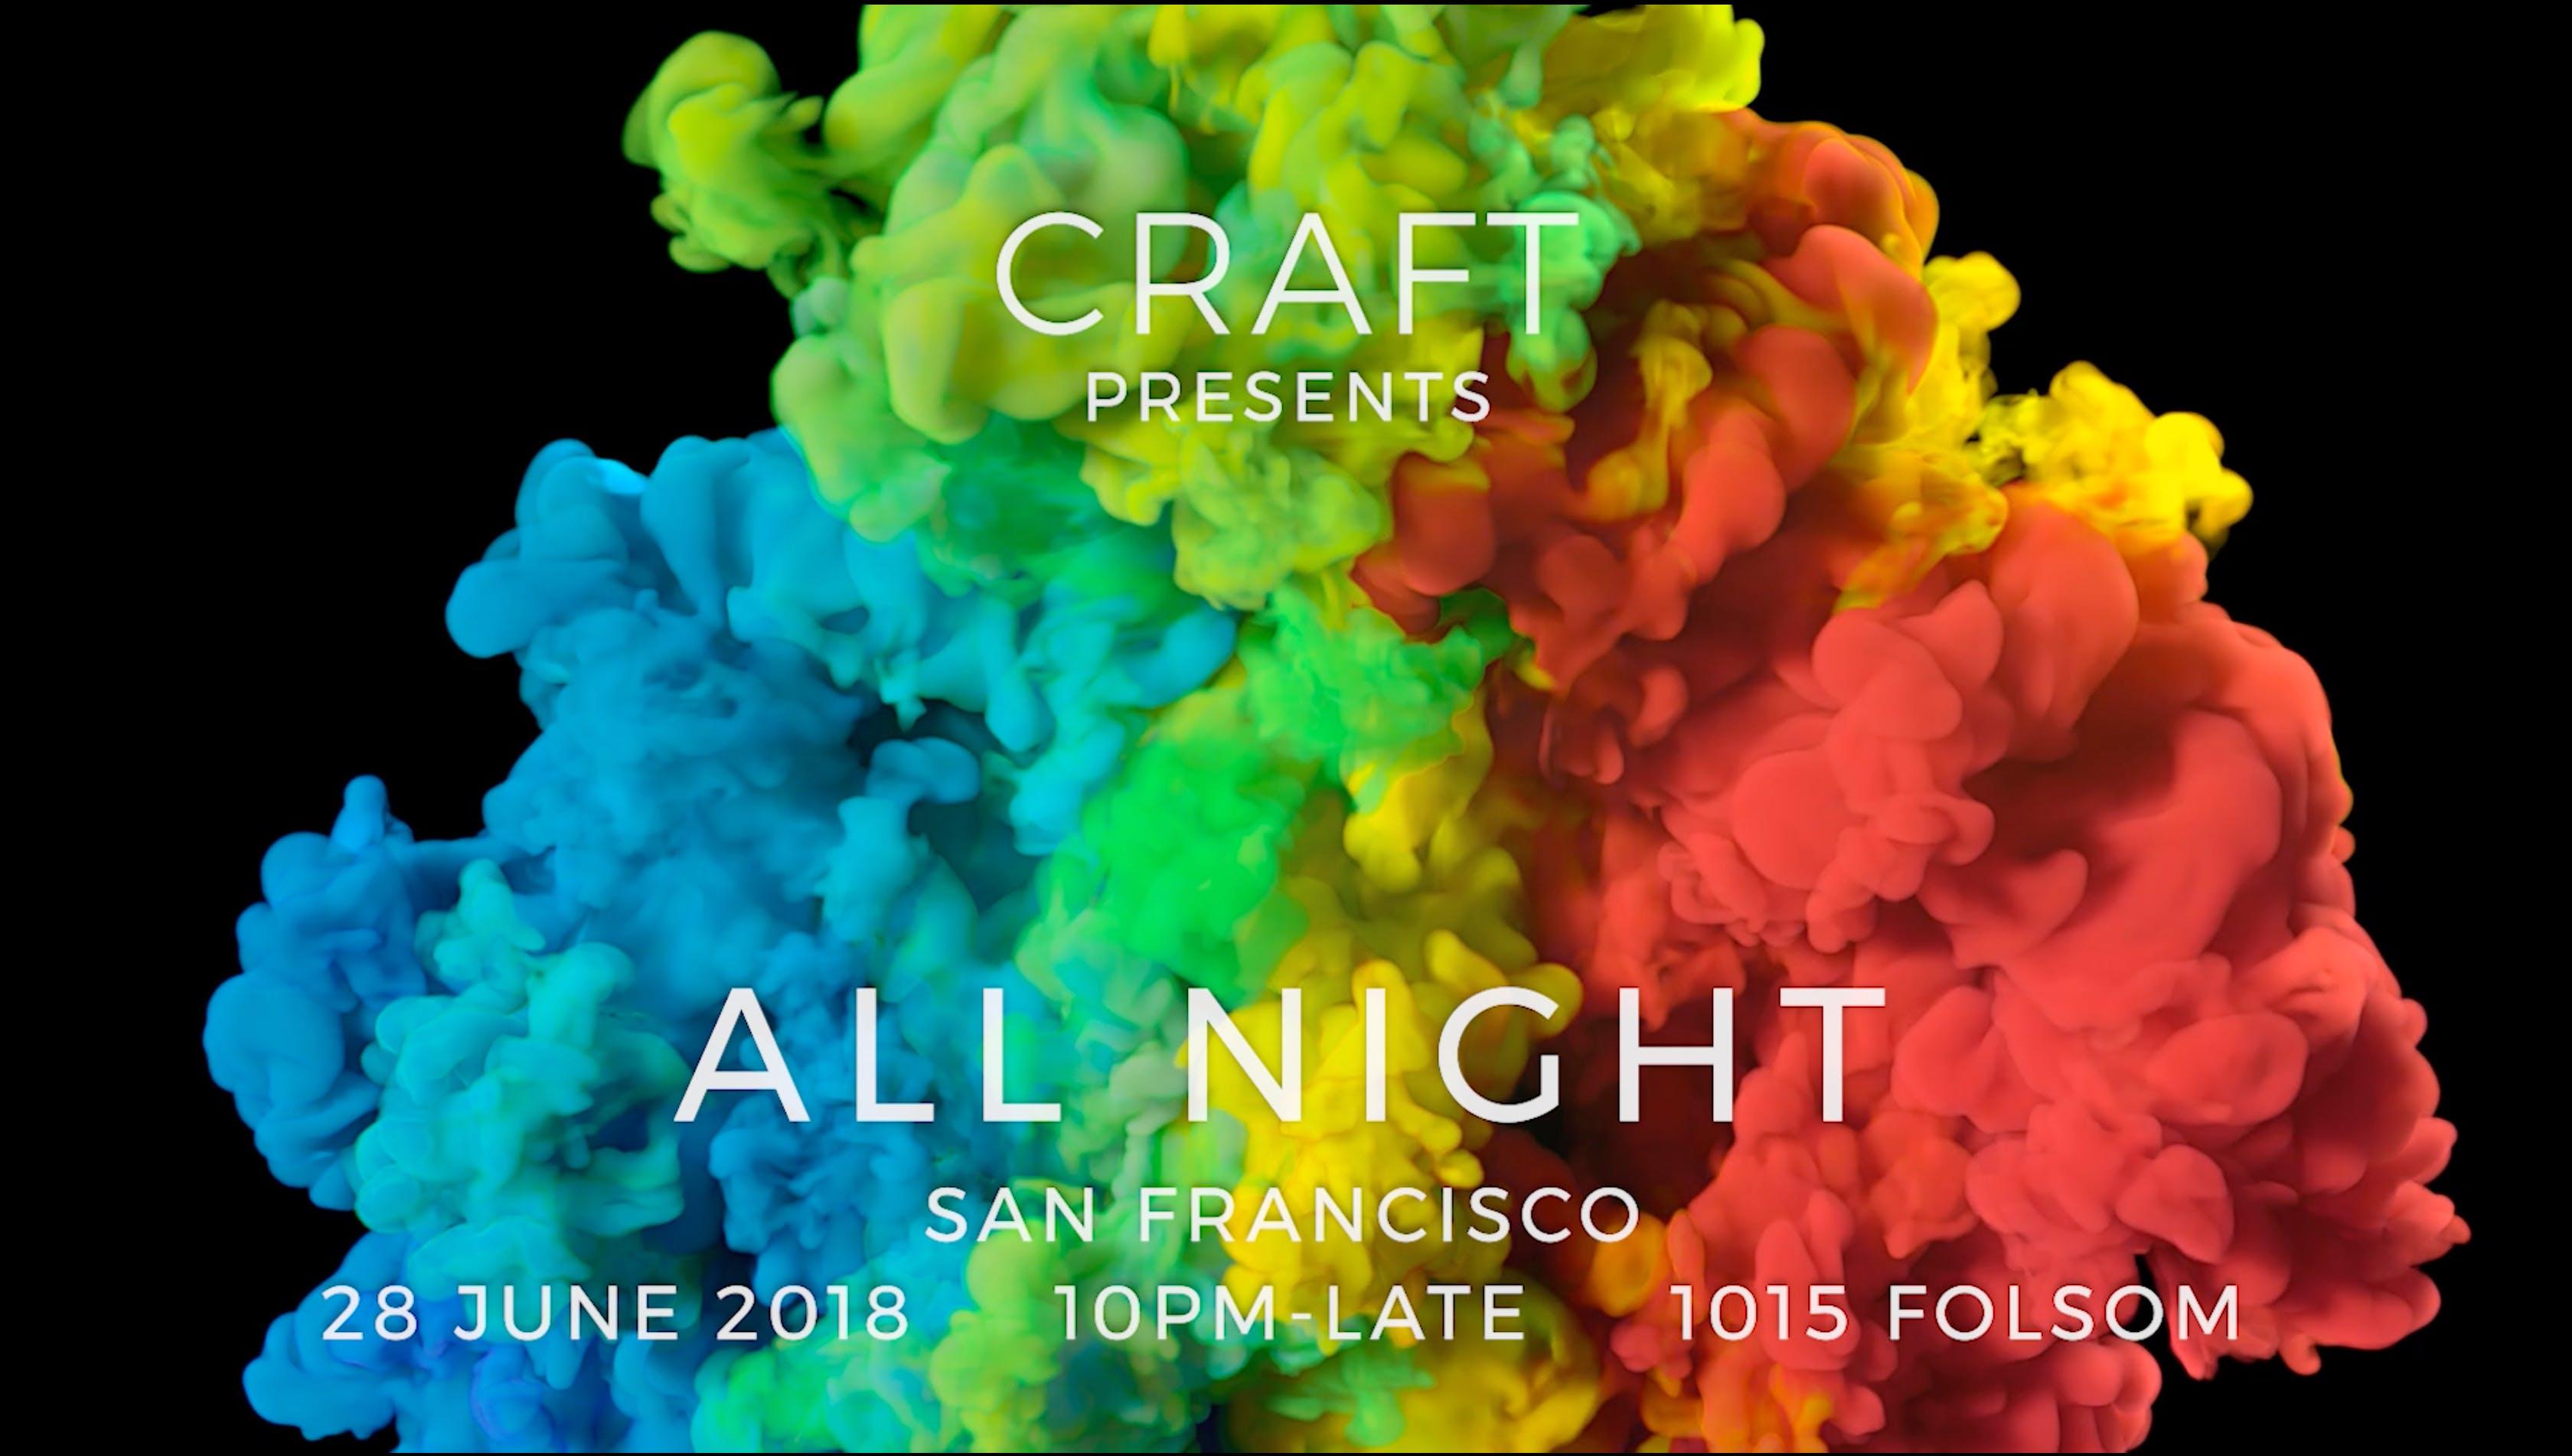 CRAFT PRESENTS ALL NIGHT at 1015 FOLSOM